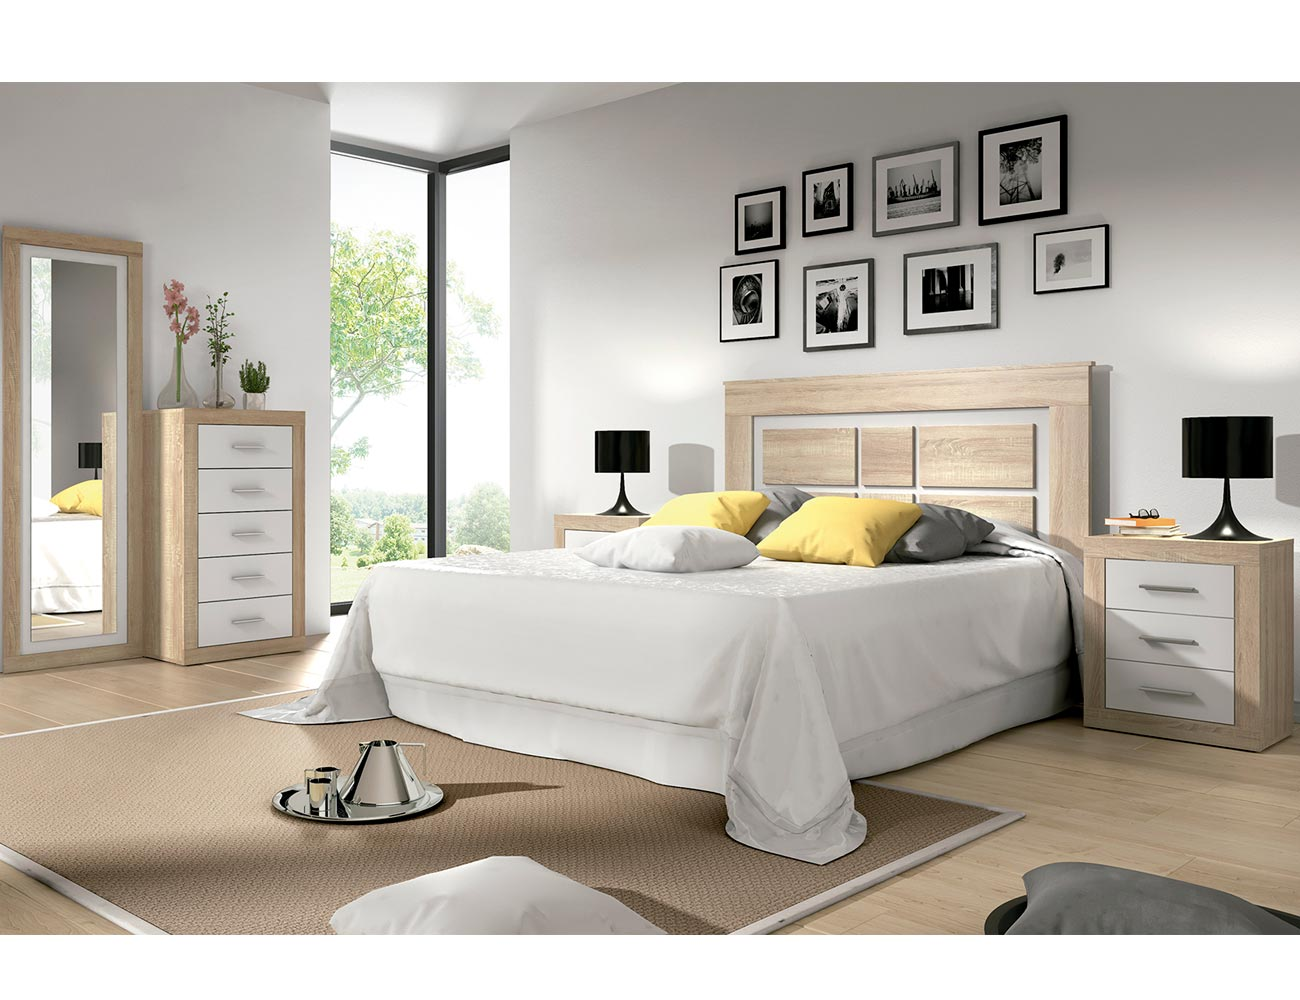 Dormitorio matrimonio cambrian blanco comoda